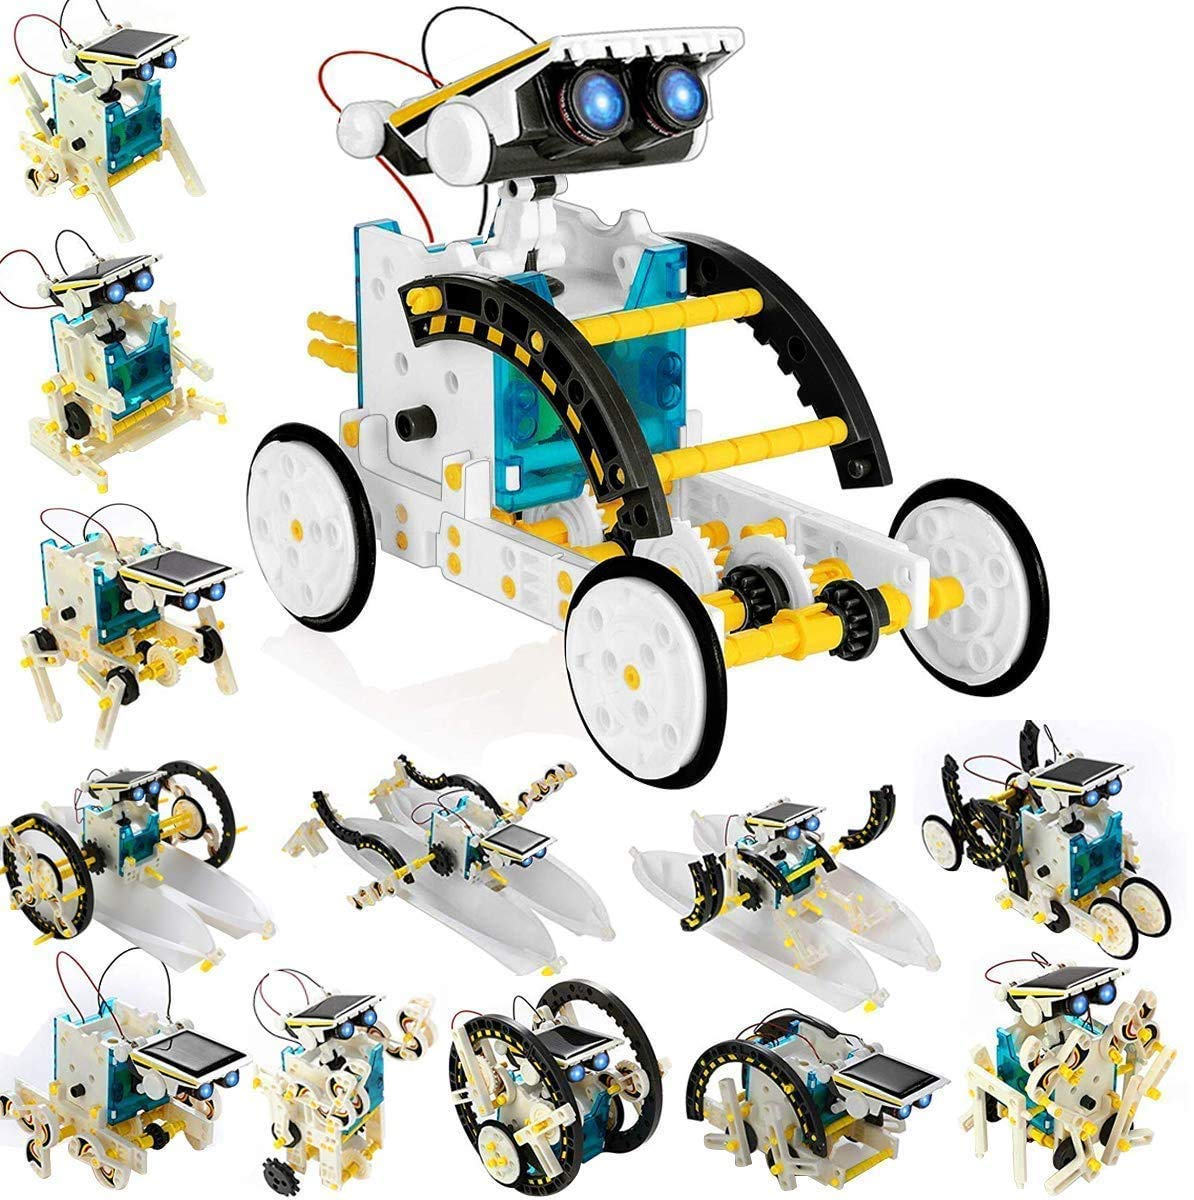 RVold 13-in-1 Educational Solar Robotic Kit